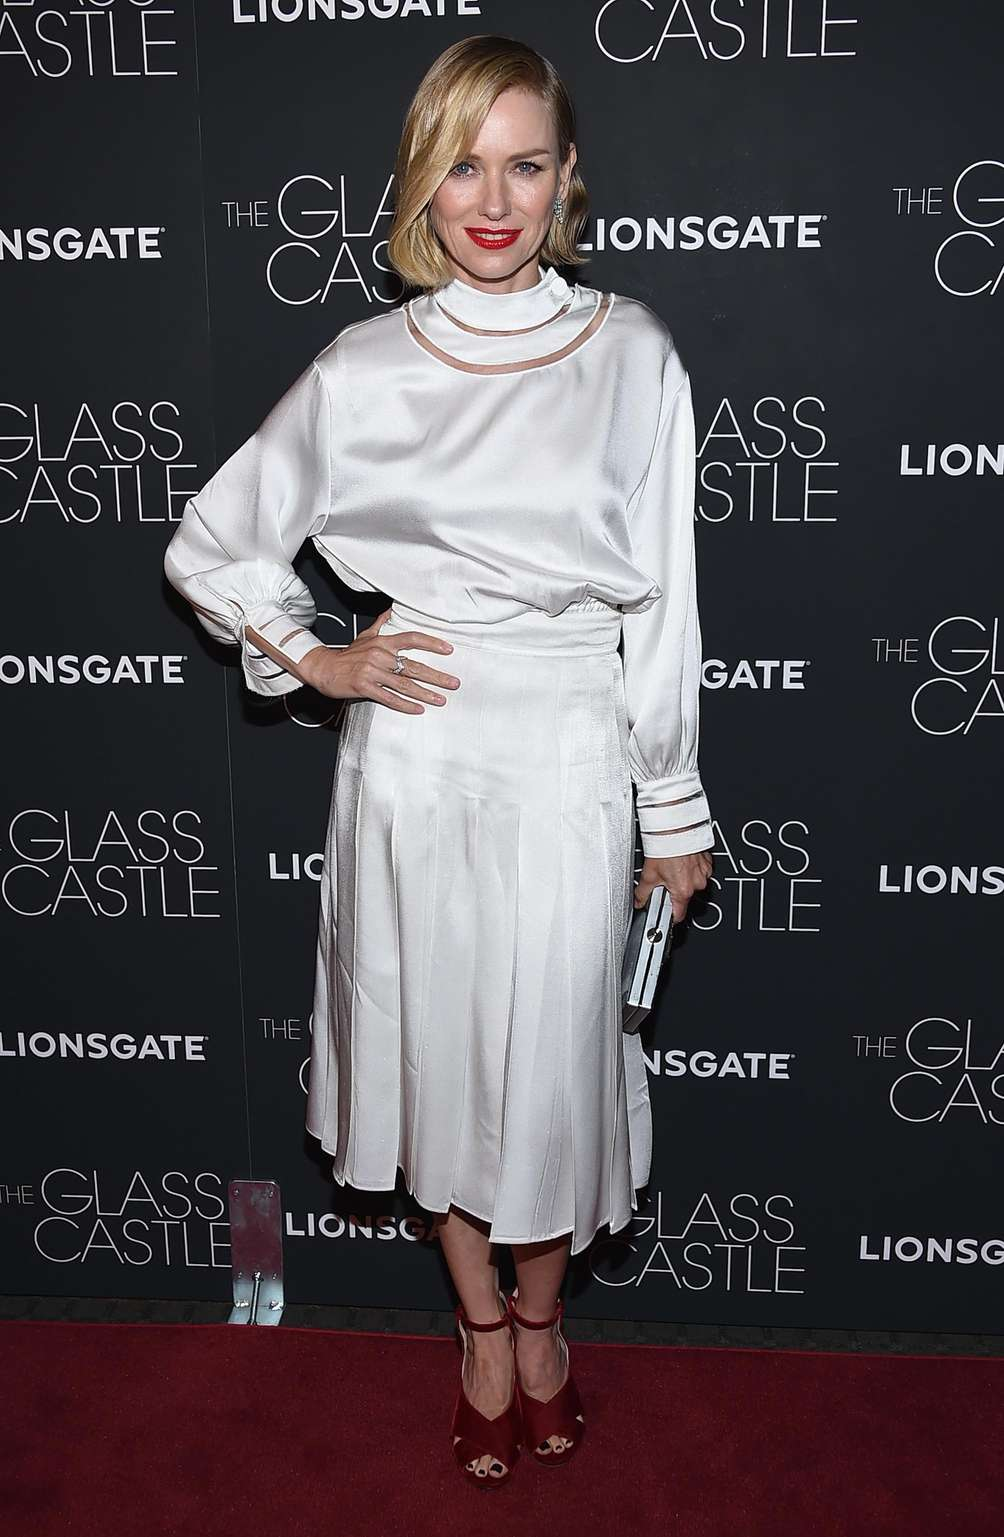 Naomi Watts at the New York City premiere